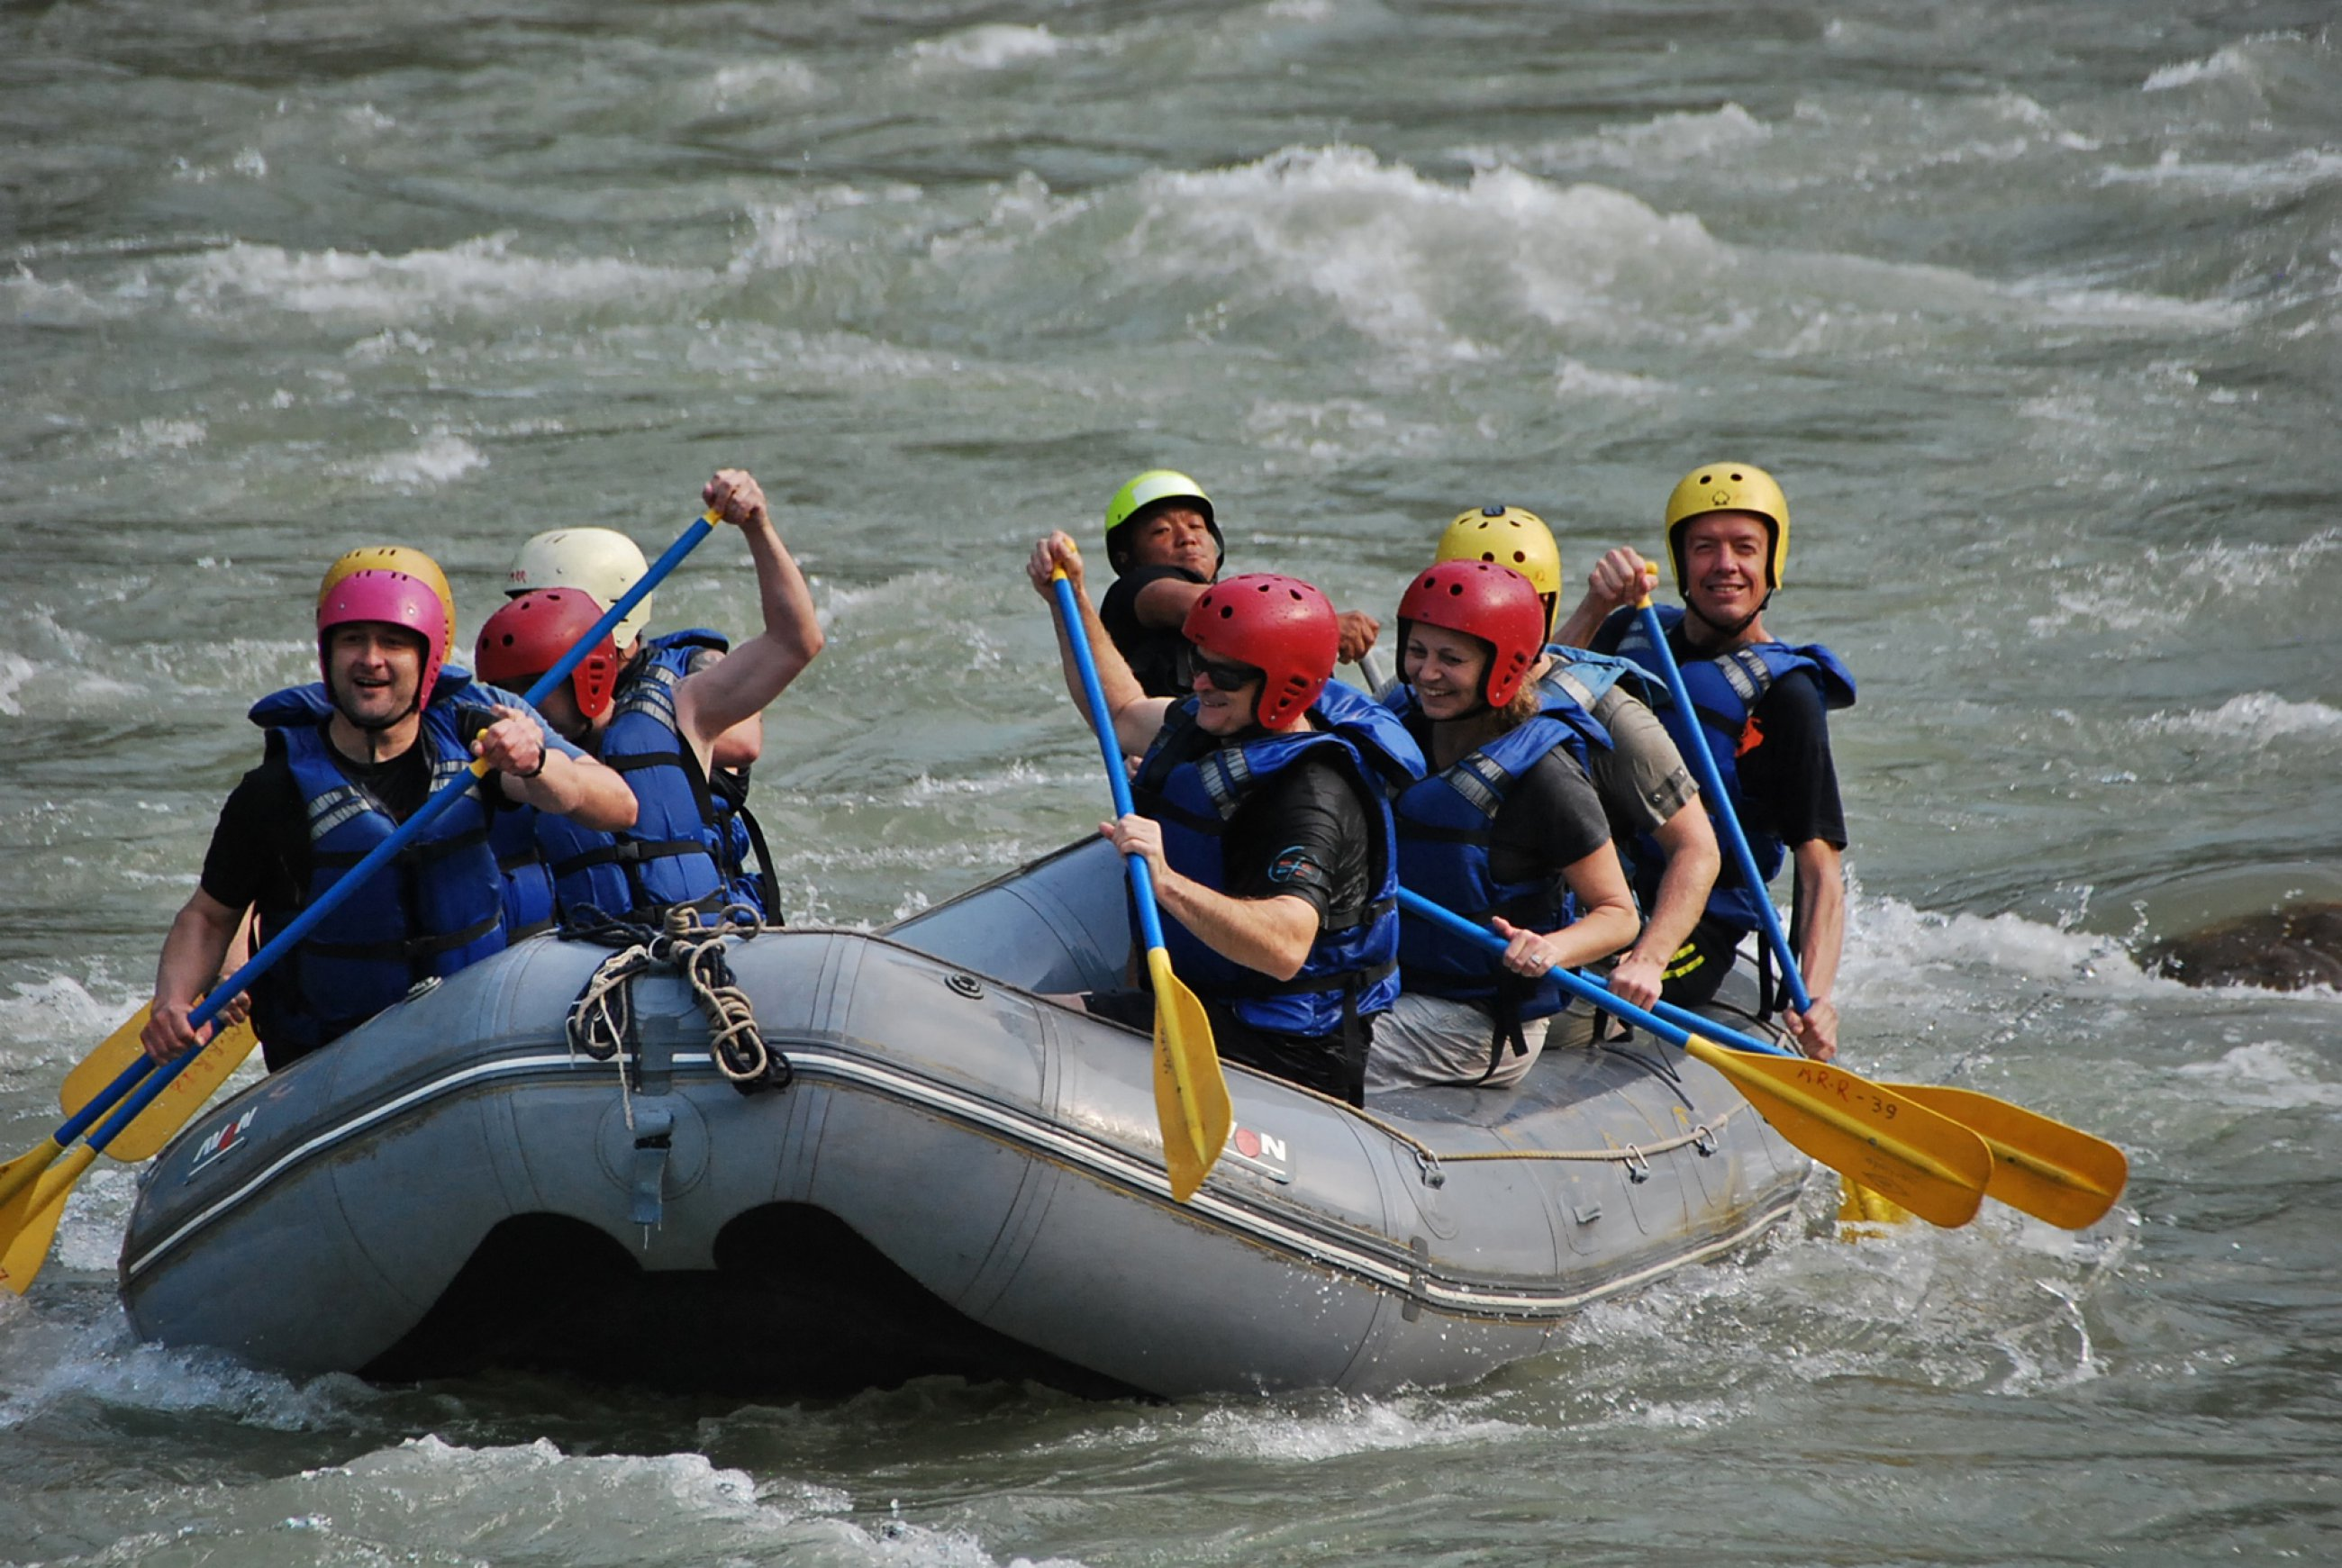 https://bubo.sk/uploads/galleries/3467/nepal-rafting-ctni-11-2014-mirka-sulka-449-.jpg